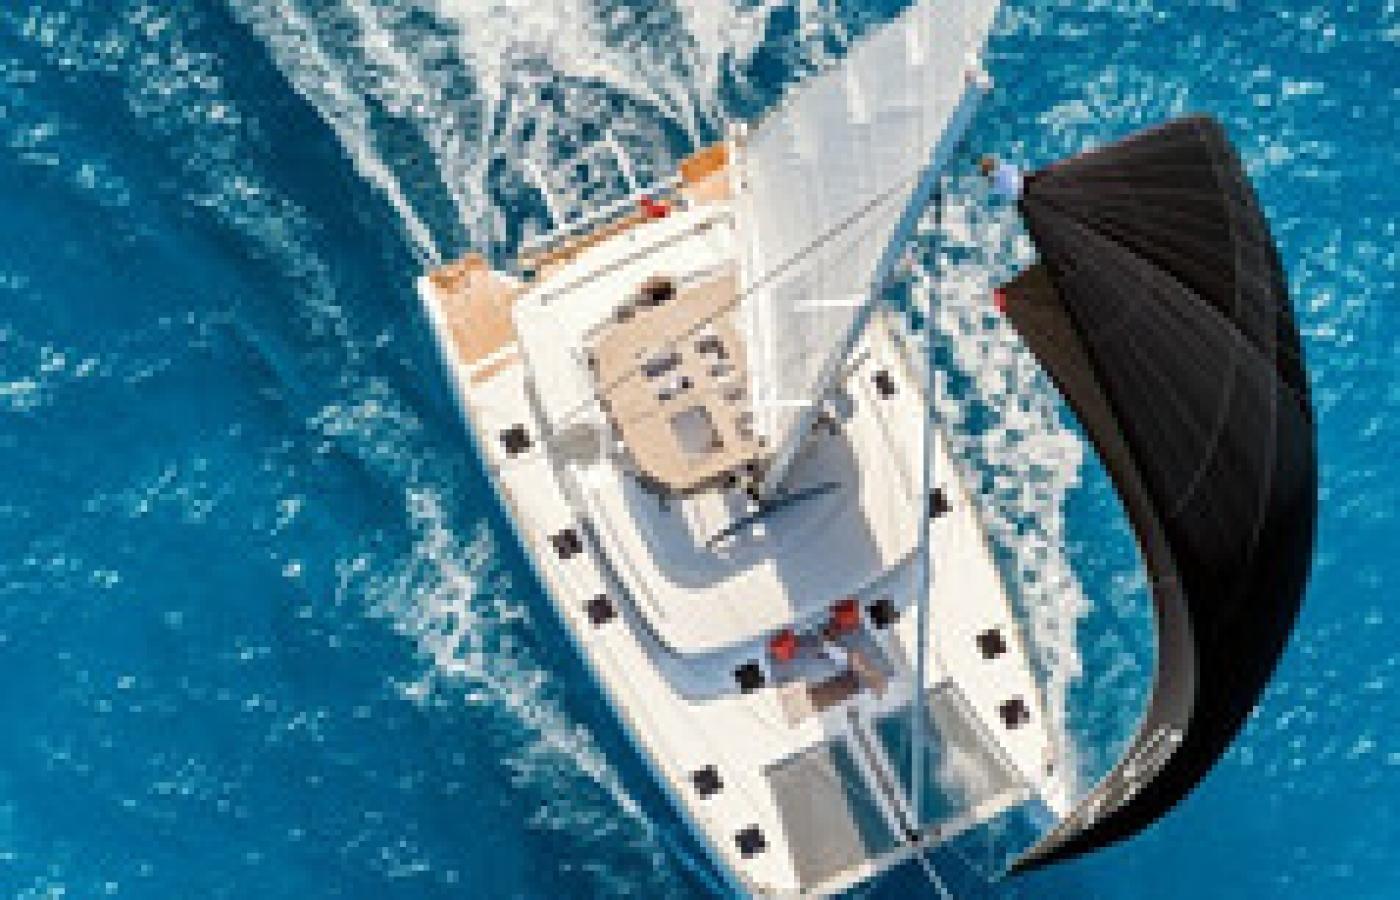 Birdseye view of the catamaran